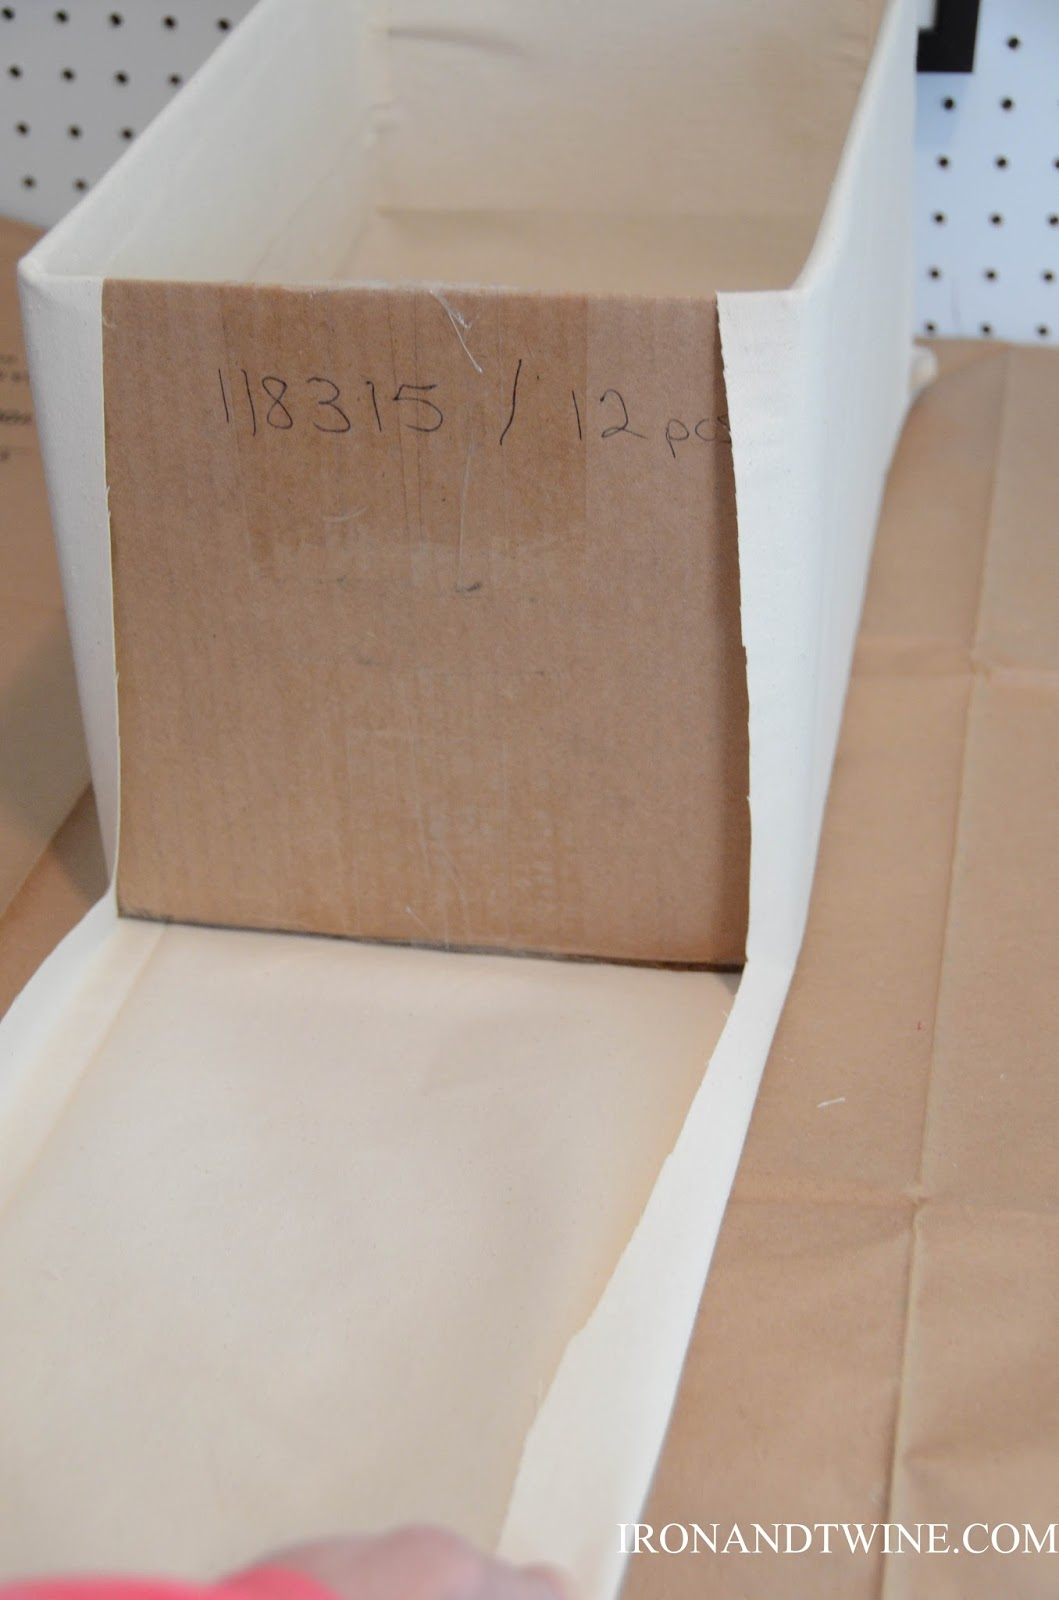 DIY+Belt+Handled+Box,+DIY+fabric+covered+box,+Iron+and+Twine+(25).jpg